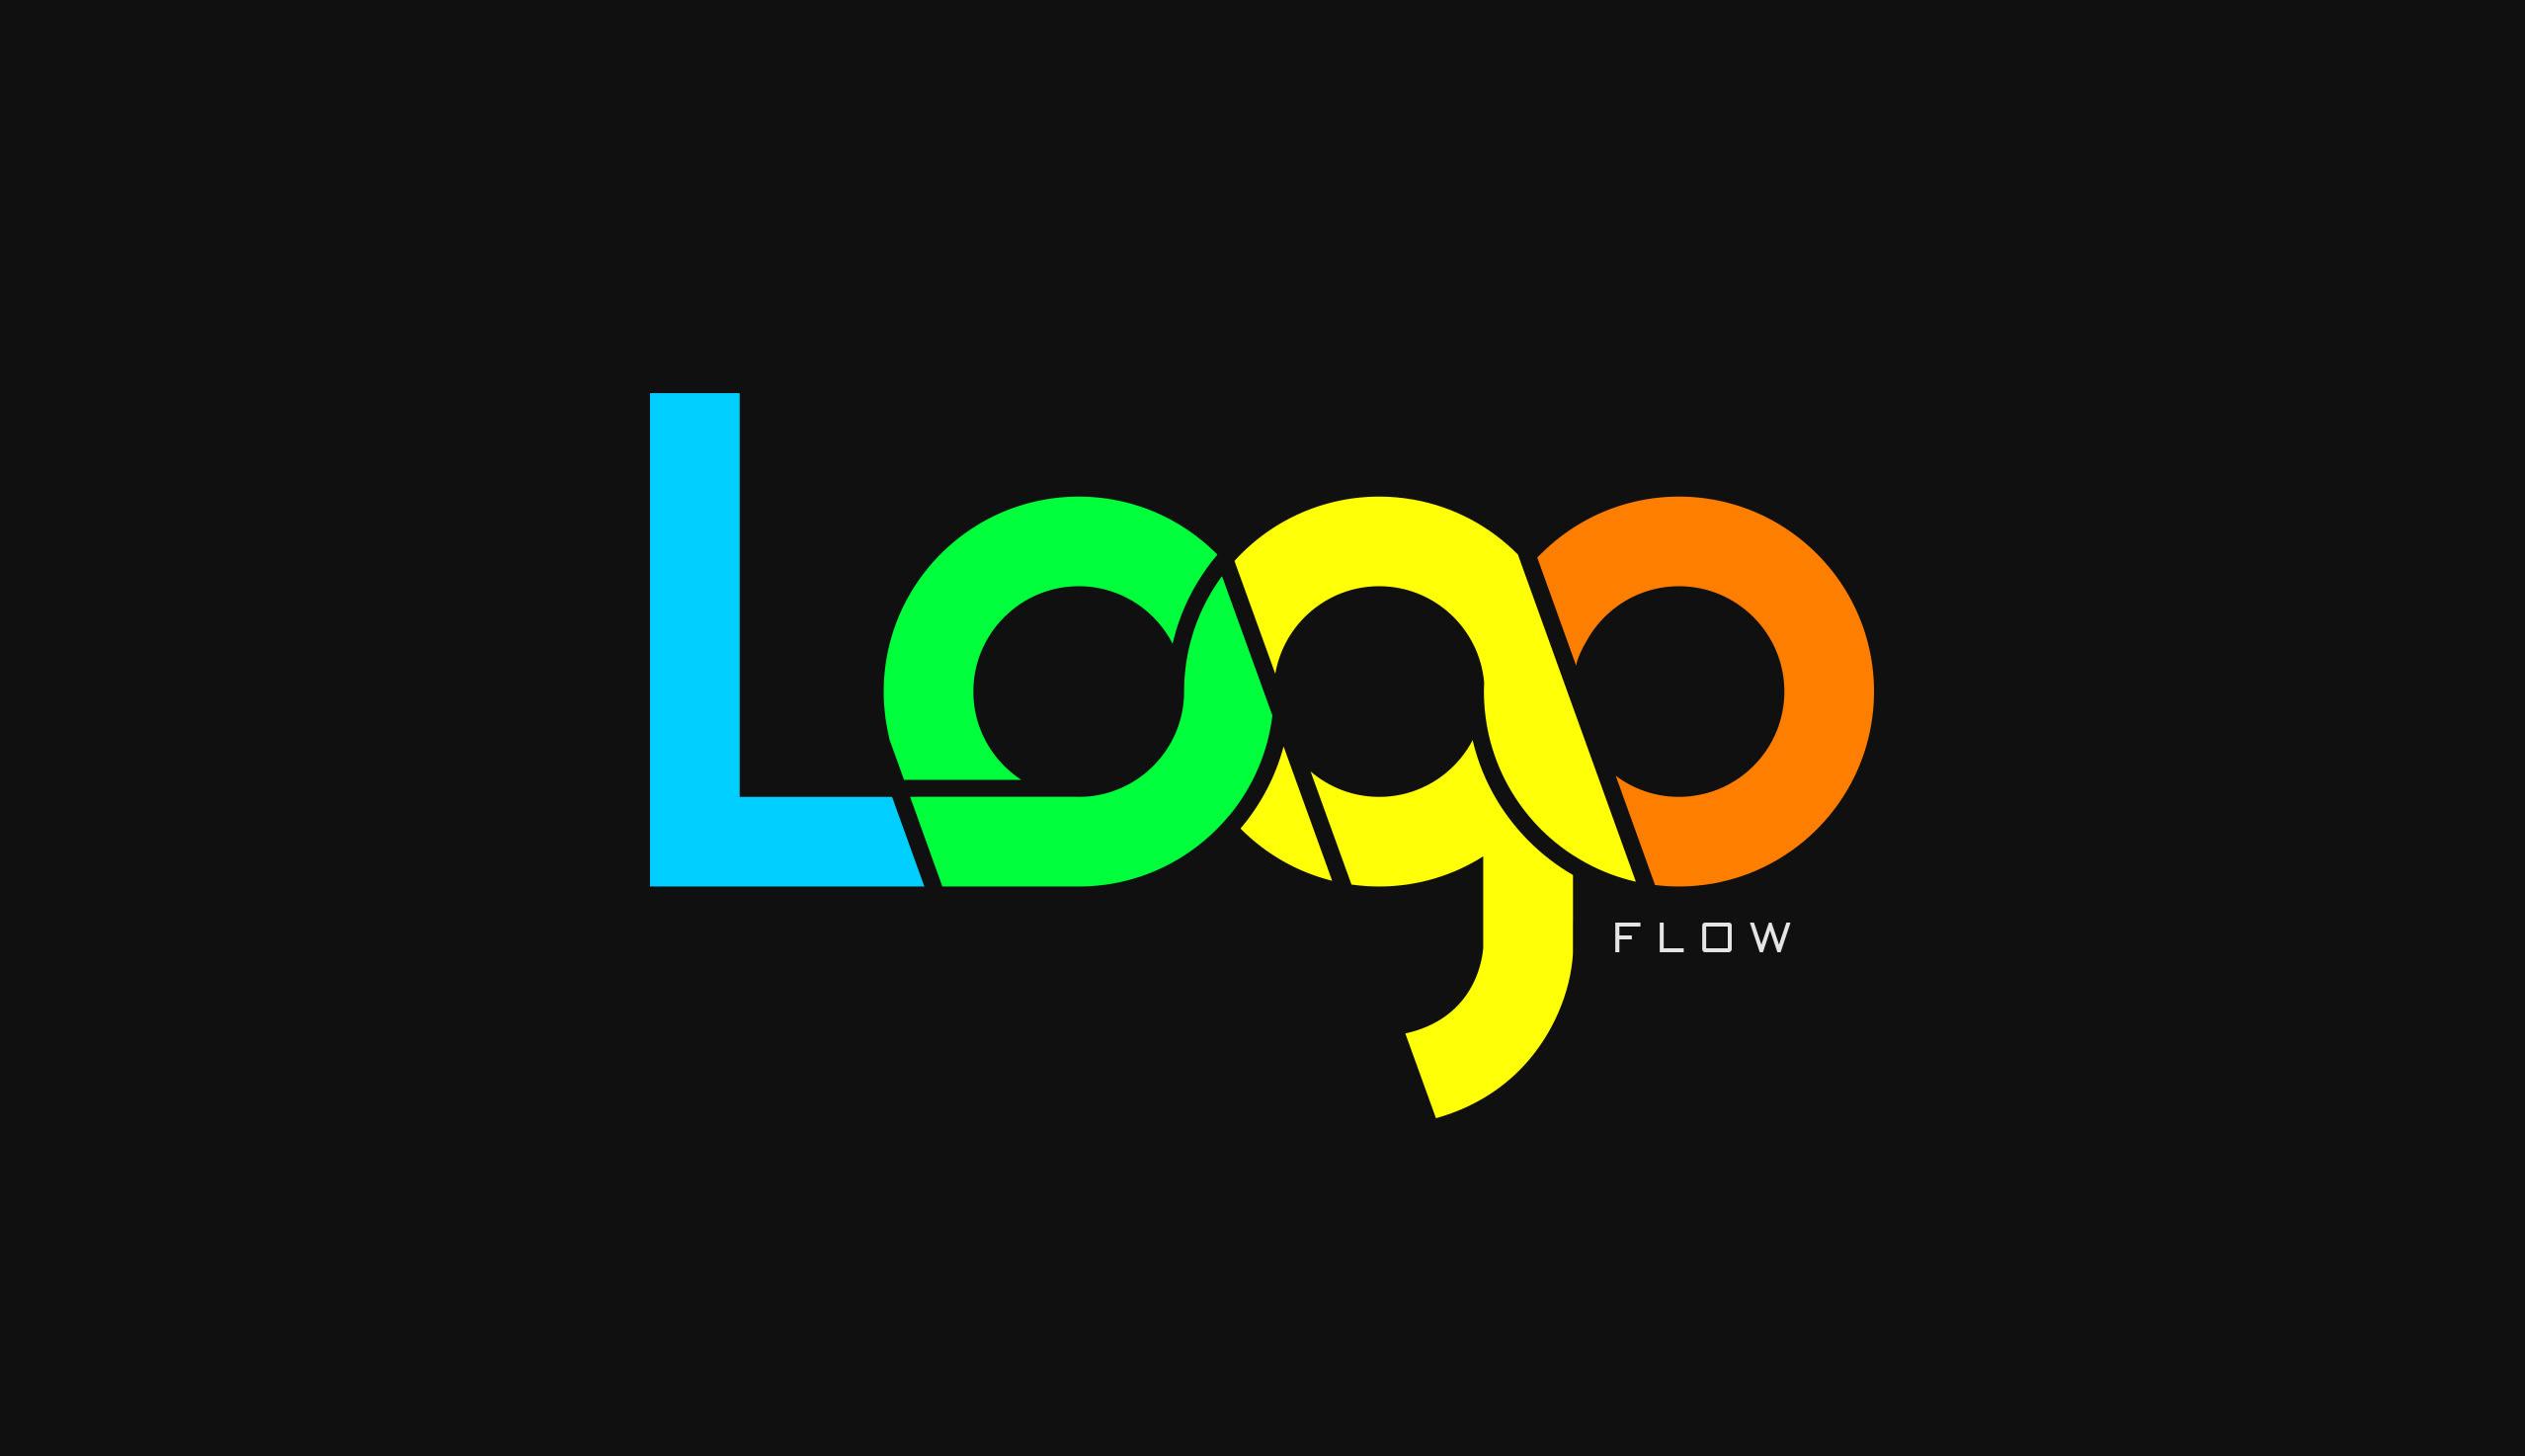 I will design 3 modern minimalist logo design in 48 hours